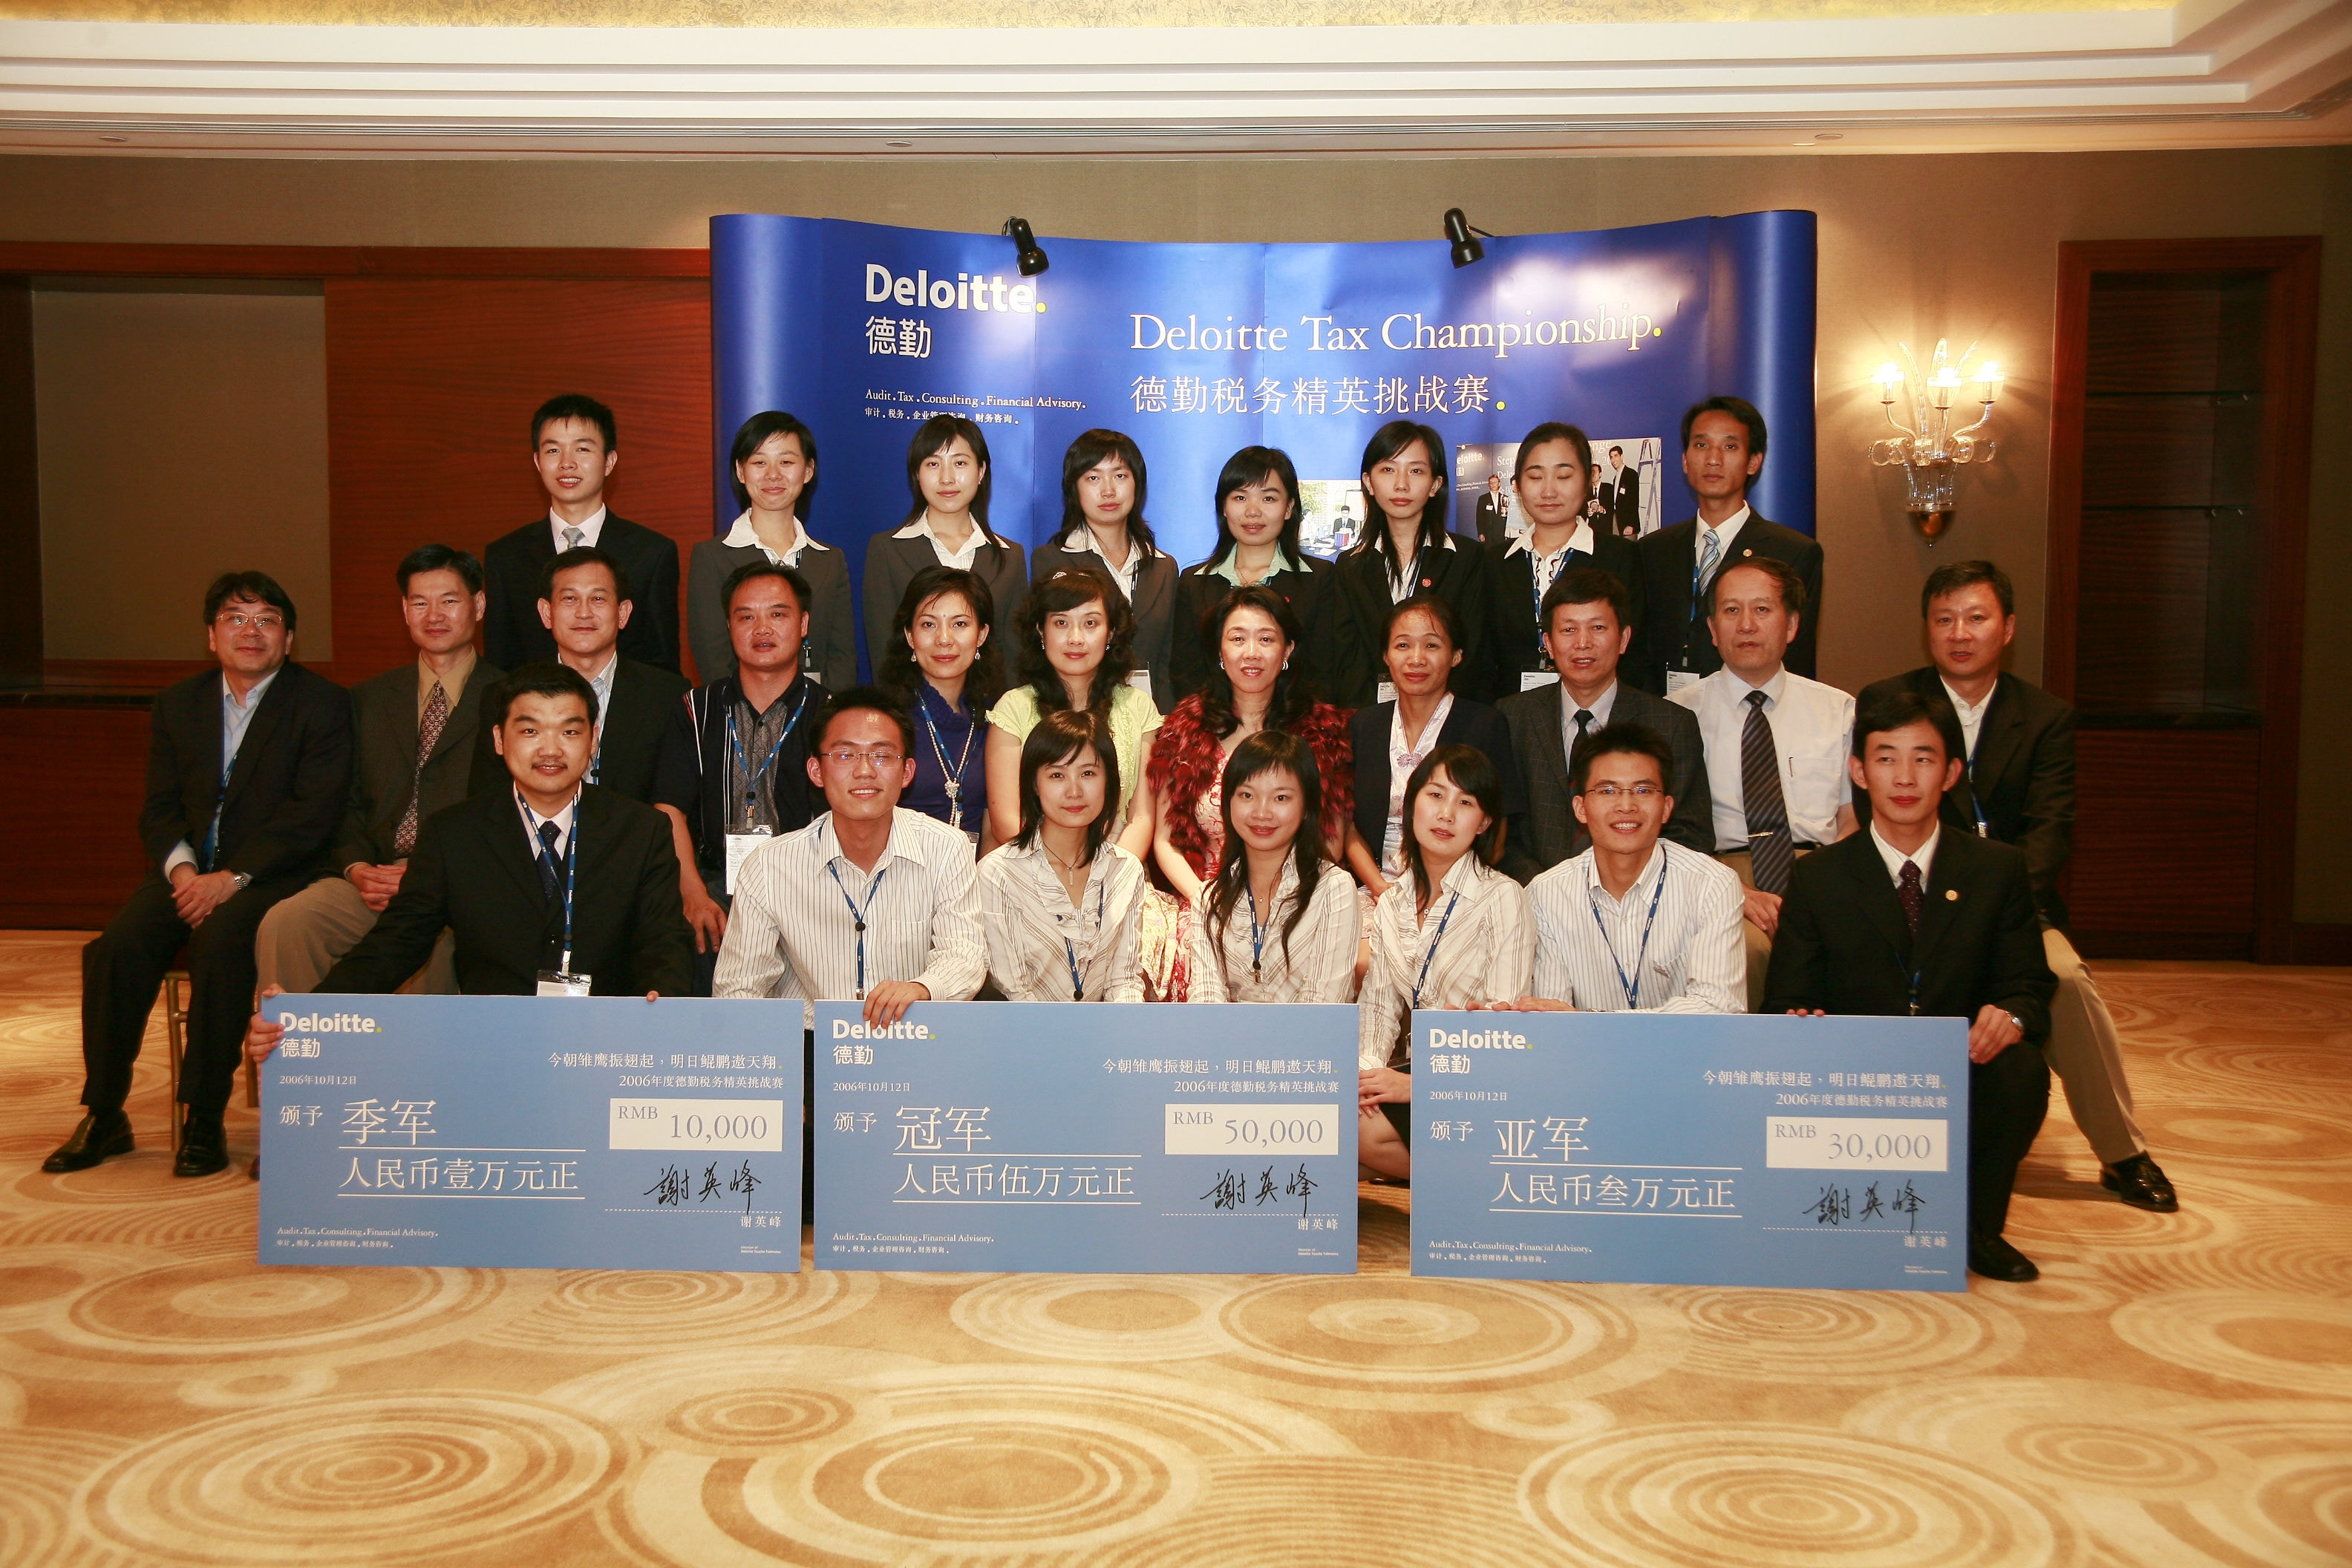 Deloitte Undergraduate Case Competition   EatRite Groceries  Awarded